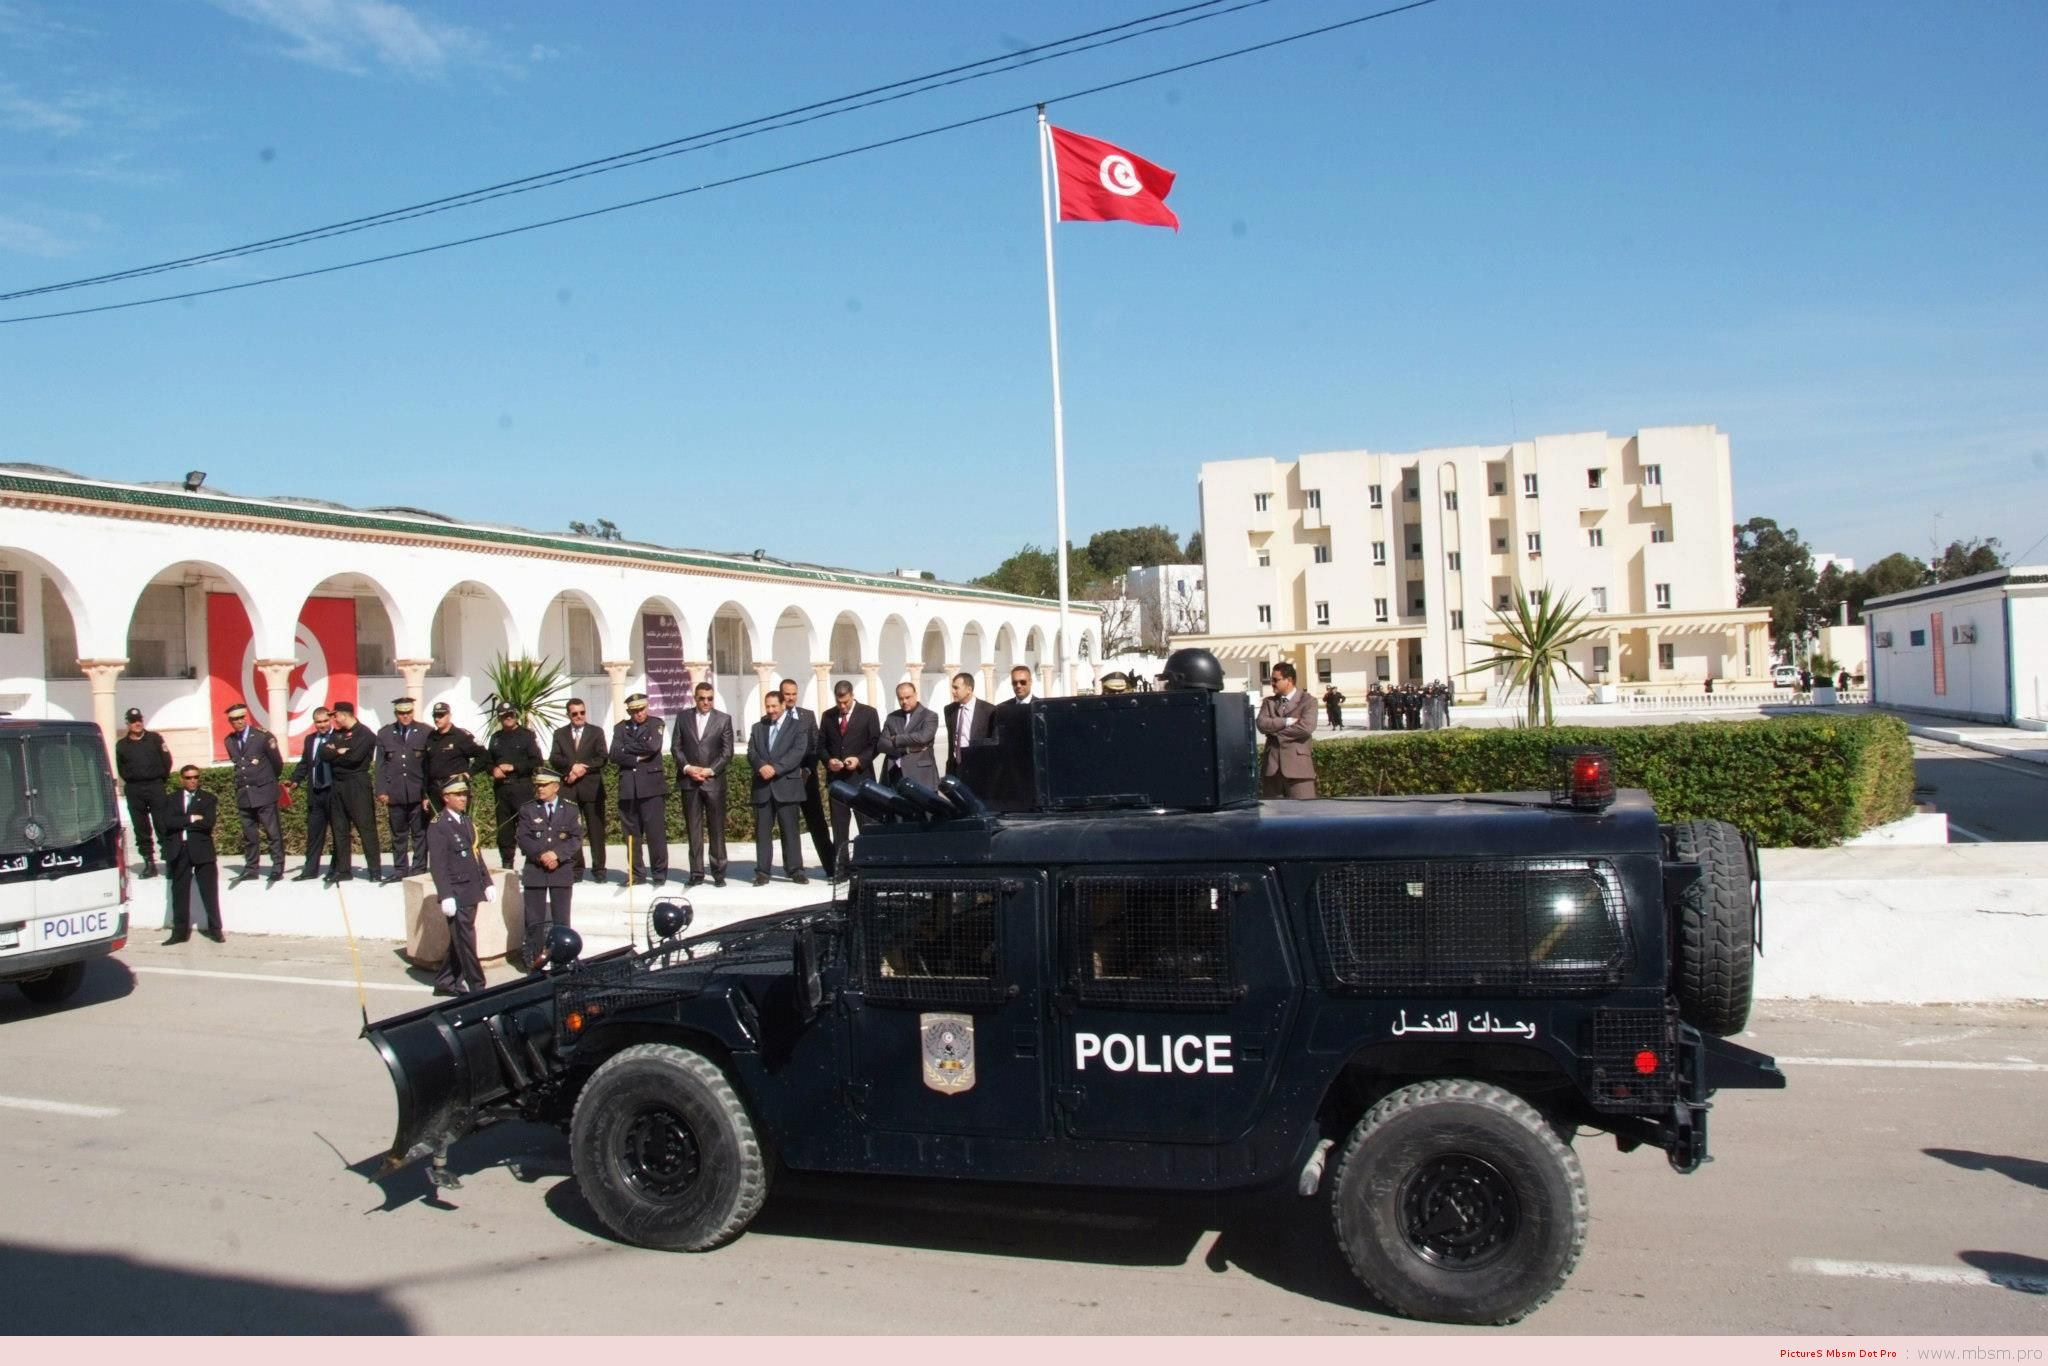 mbsm-dot-pro-wwwmbsmpro-la-tunisie-restera-debout-et-nul-ne-la-dtruira